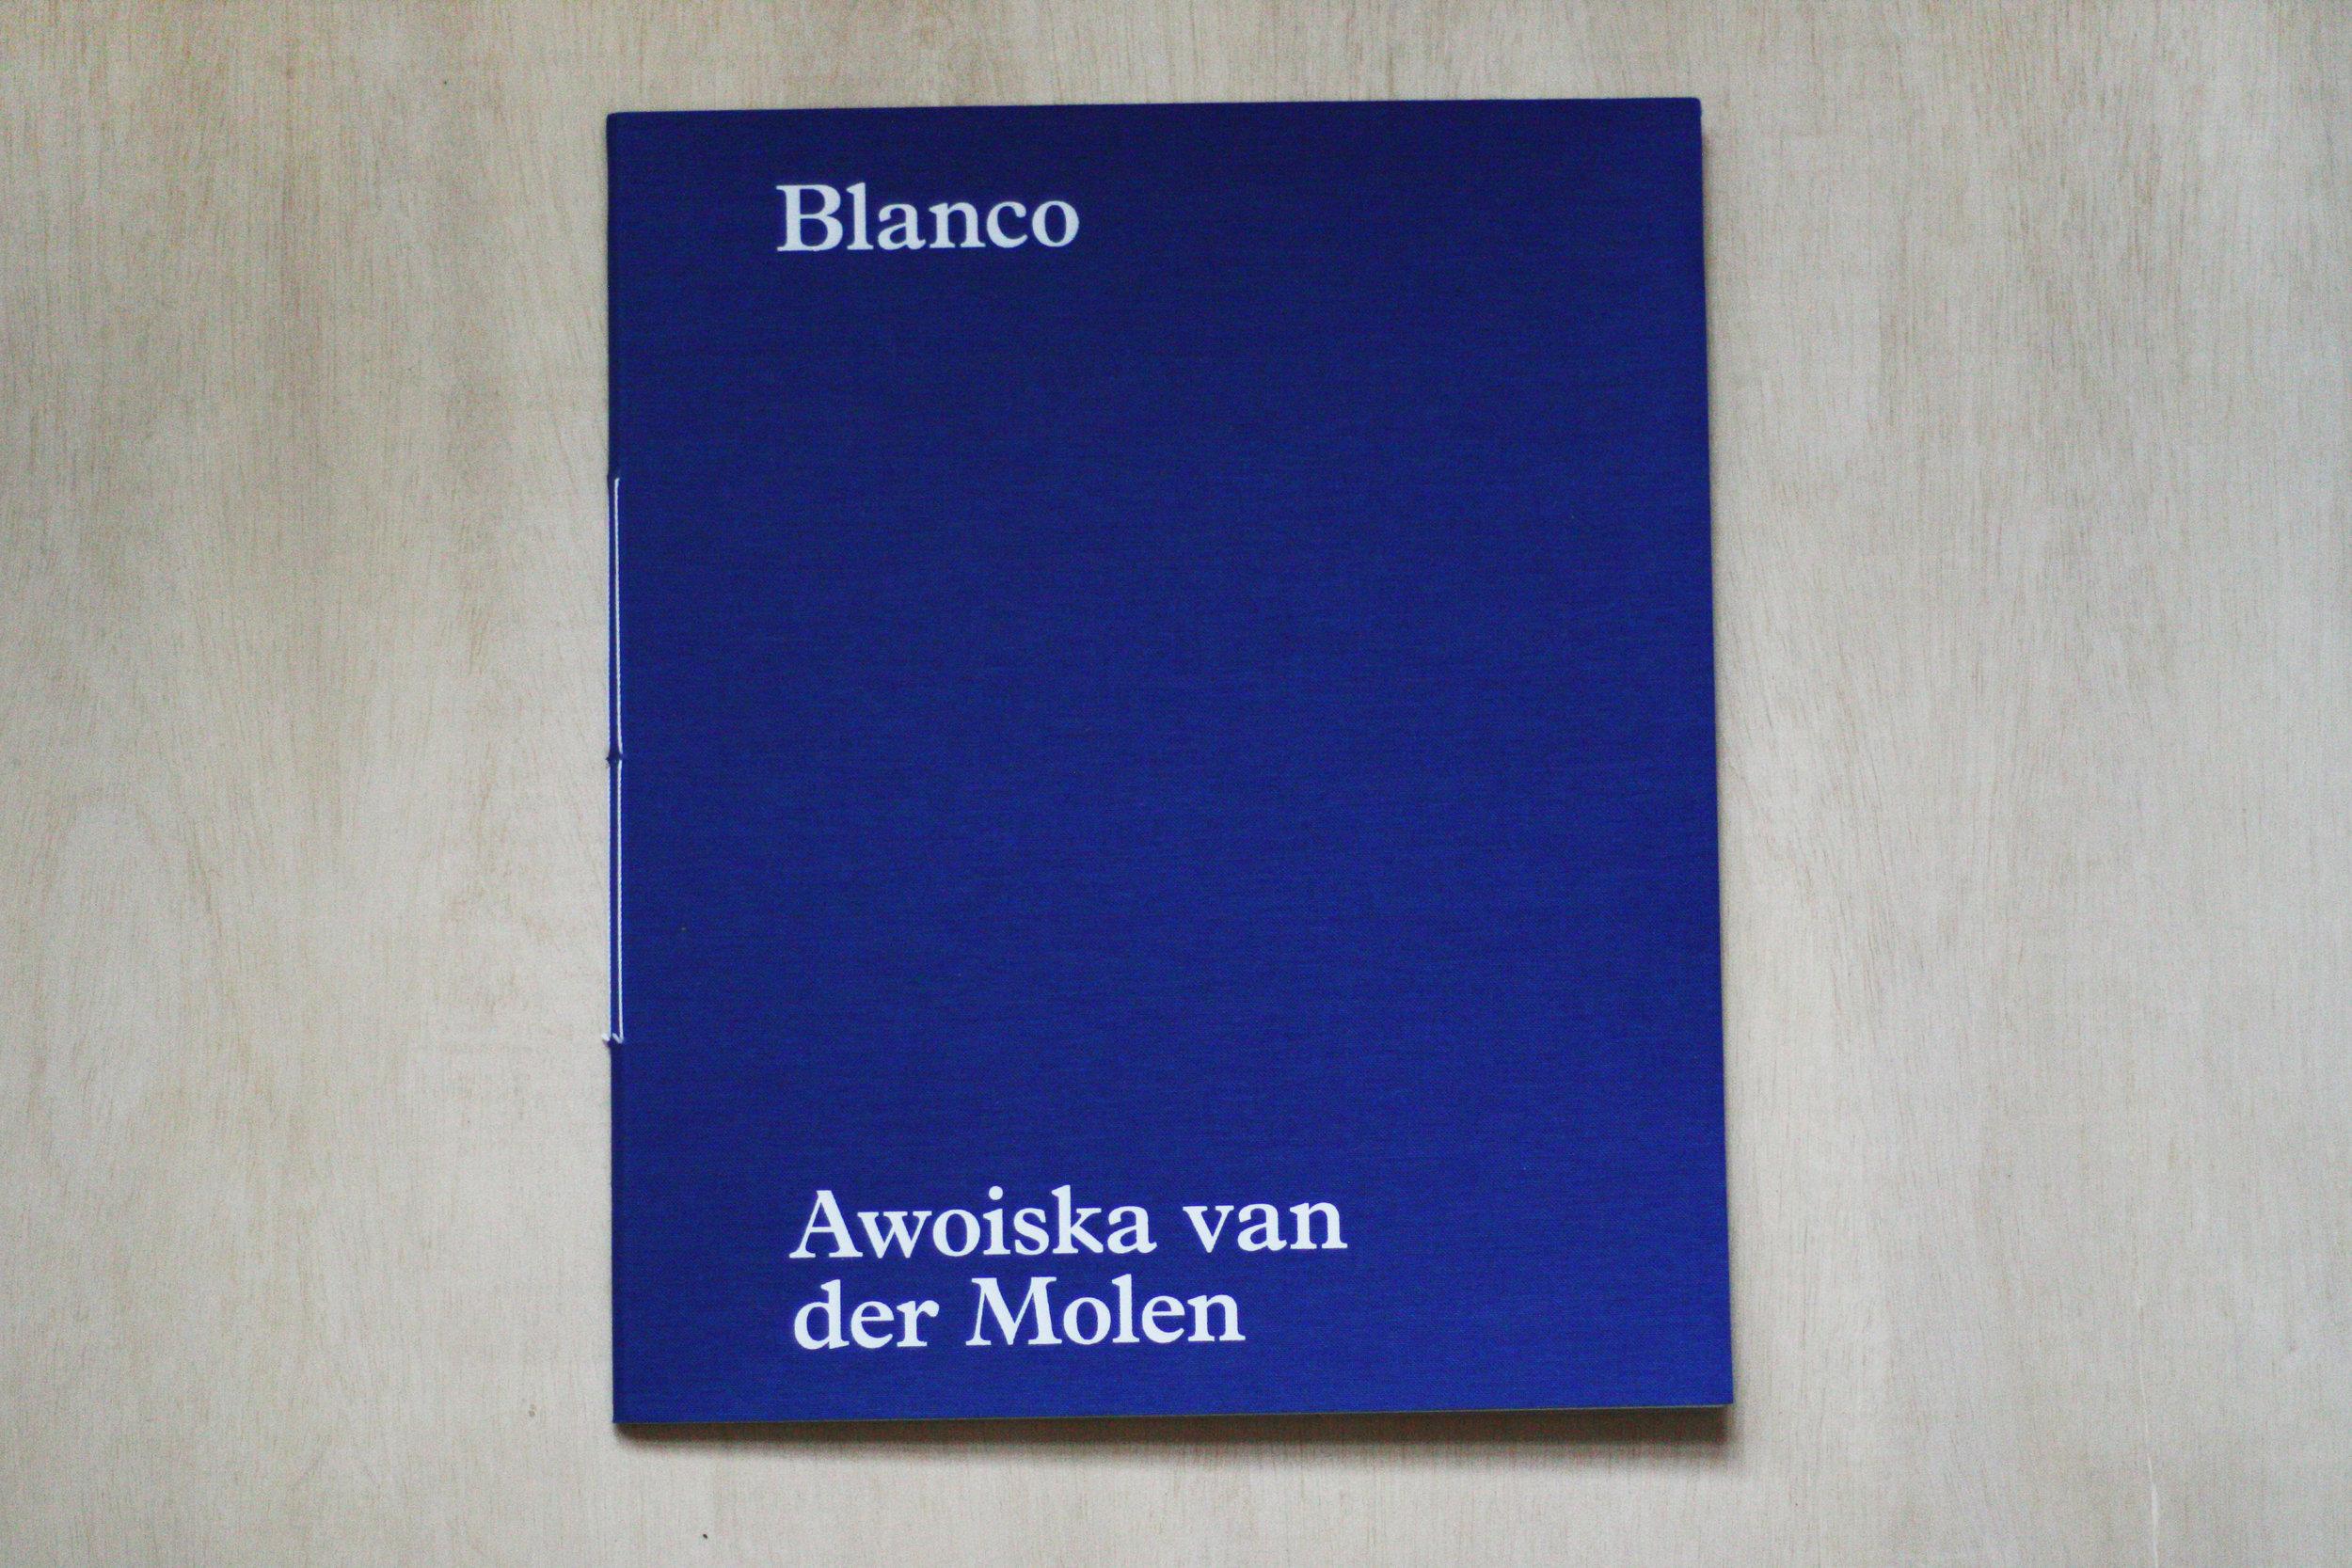 Blanco  by Awoiska van der Molen